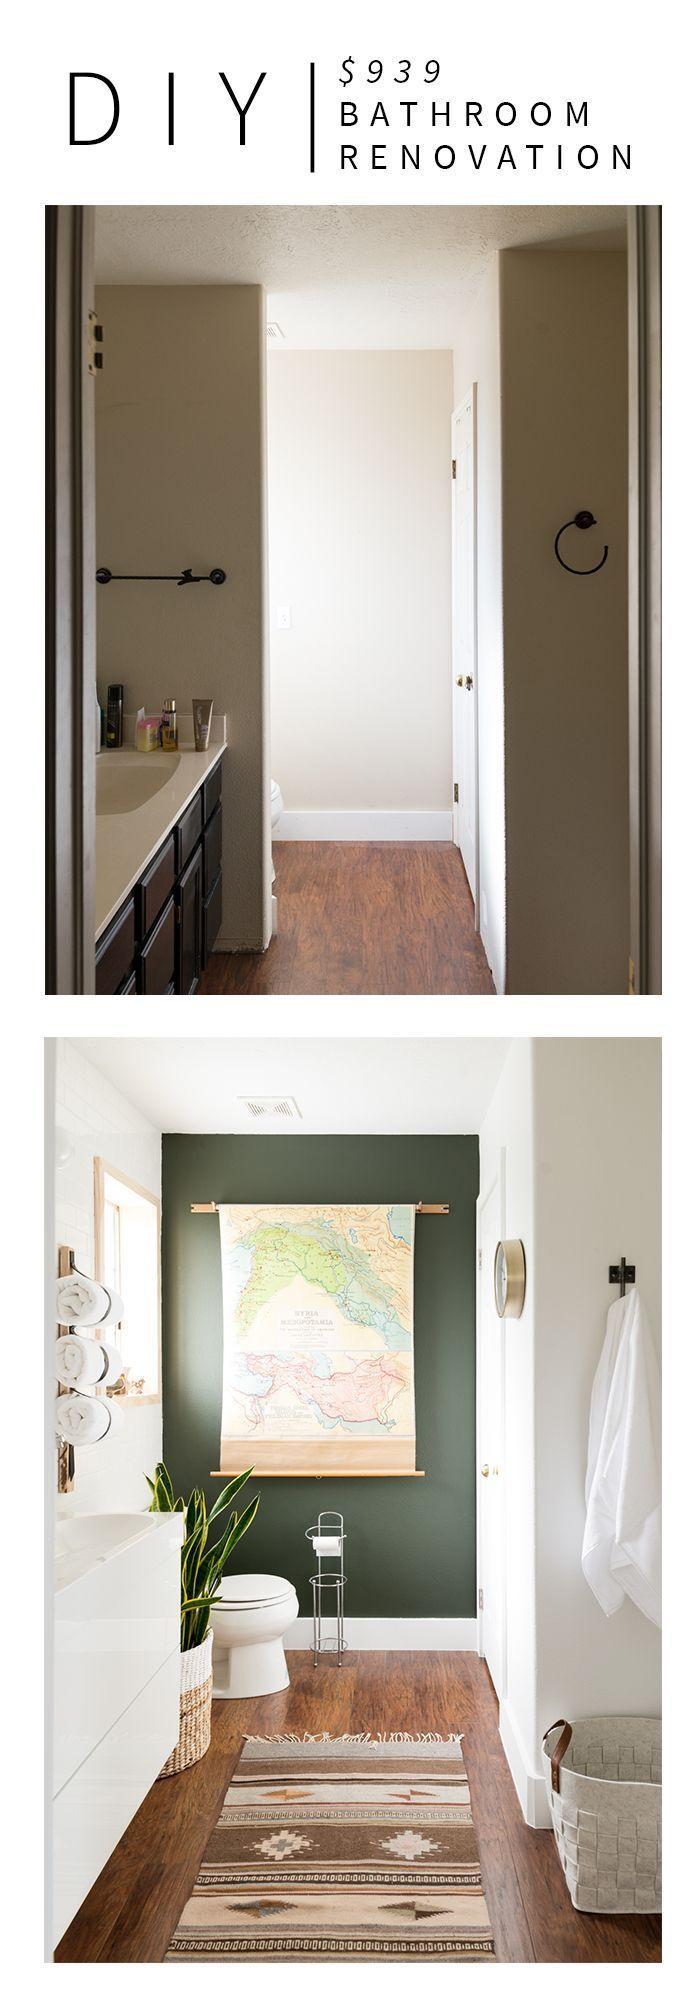 480 best bathroom ideas images on pinterest bathroom ideas room 939 diy bathroom renovation so many great ideas